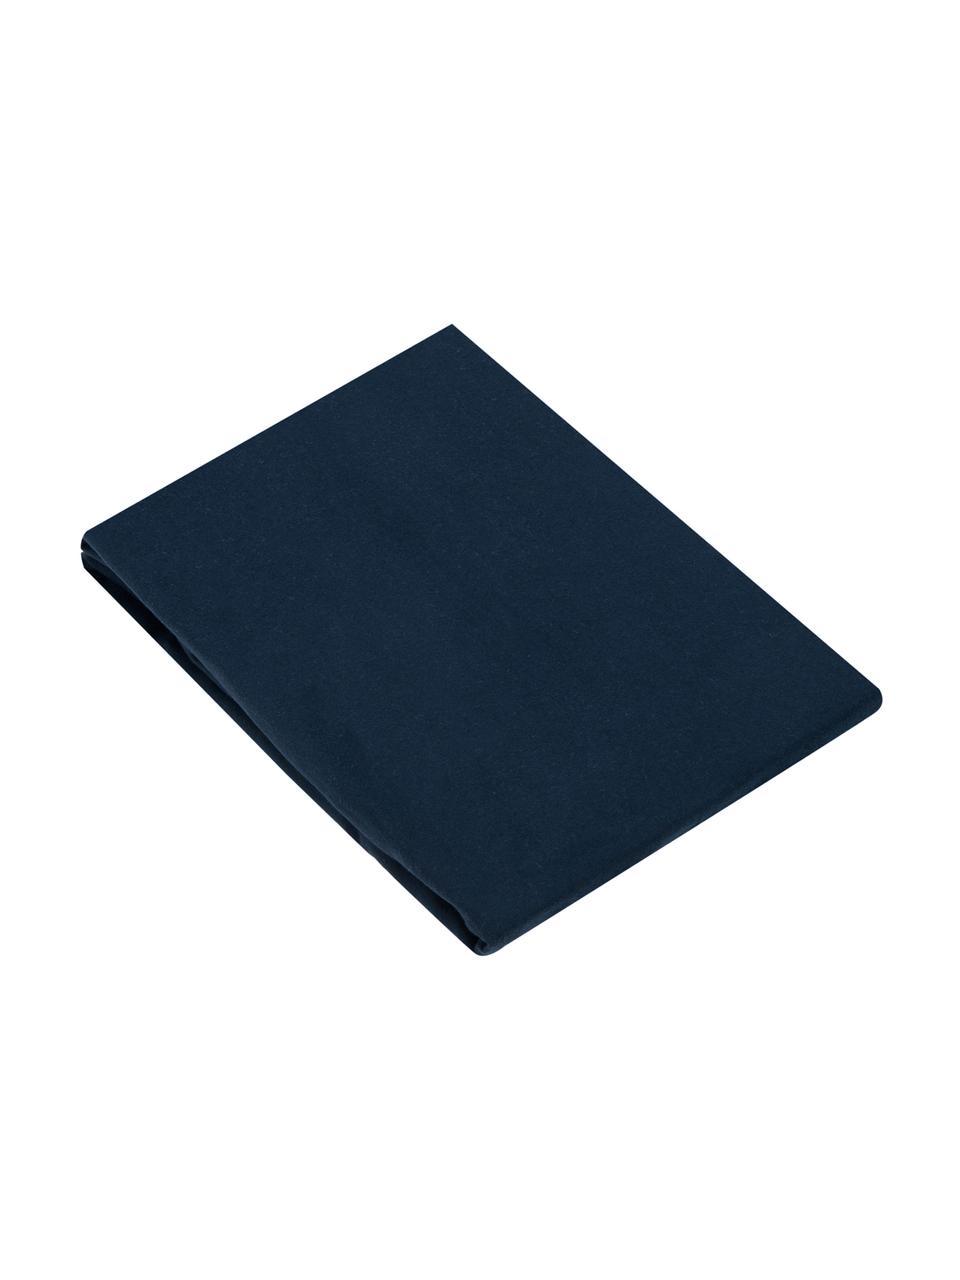 Flanell-Spannbettlaken Biba in Marineblau, Webart: Flanell, Marineblau, 180 x 200 cm